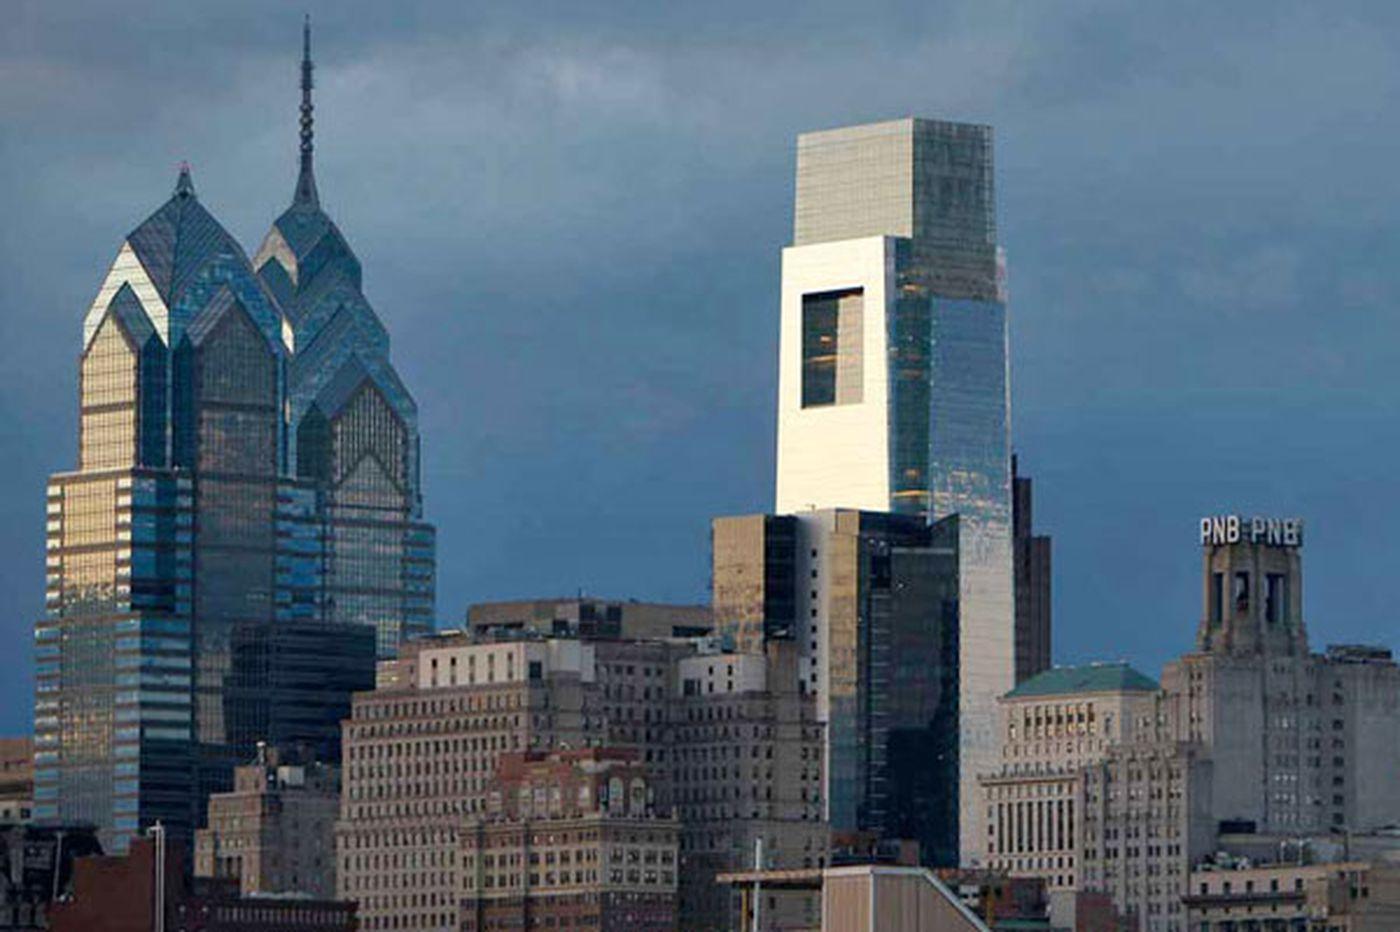 Philadelphia gains population despite challenges